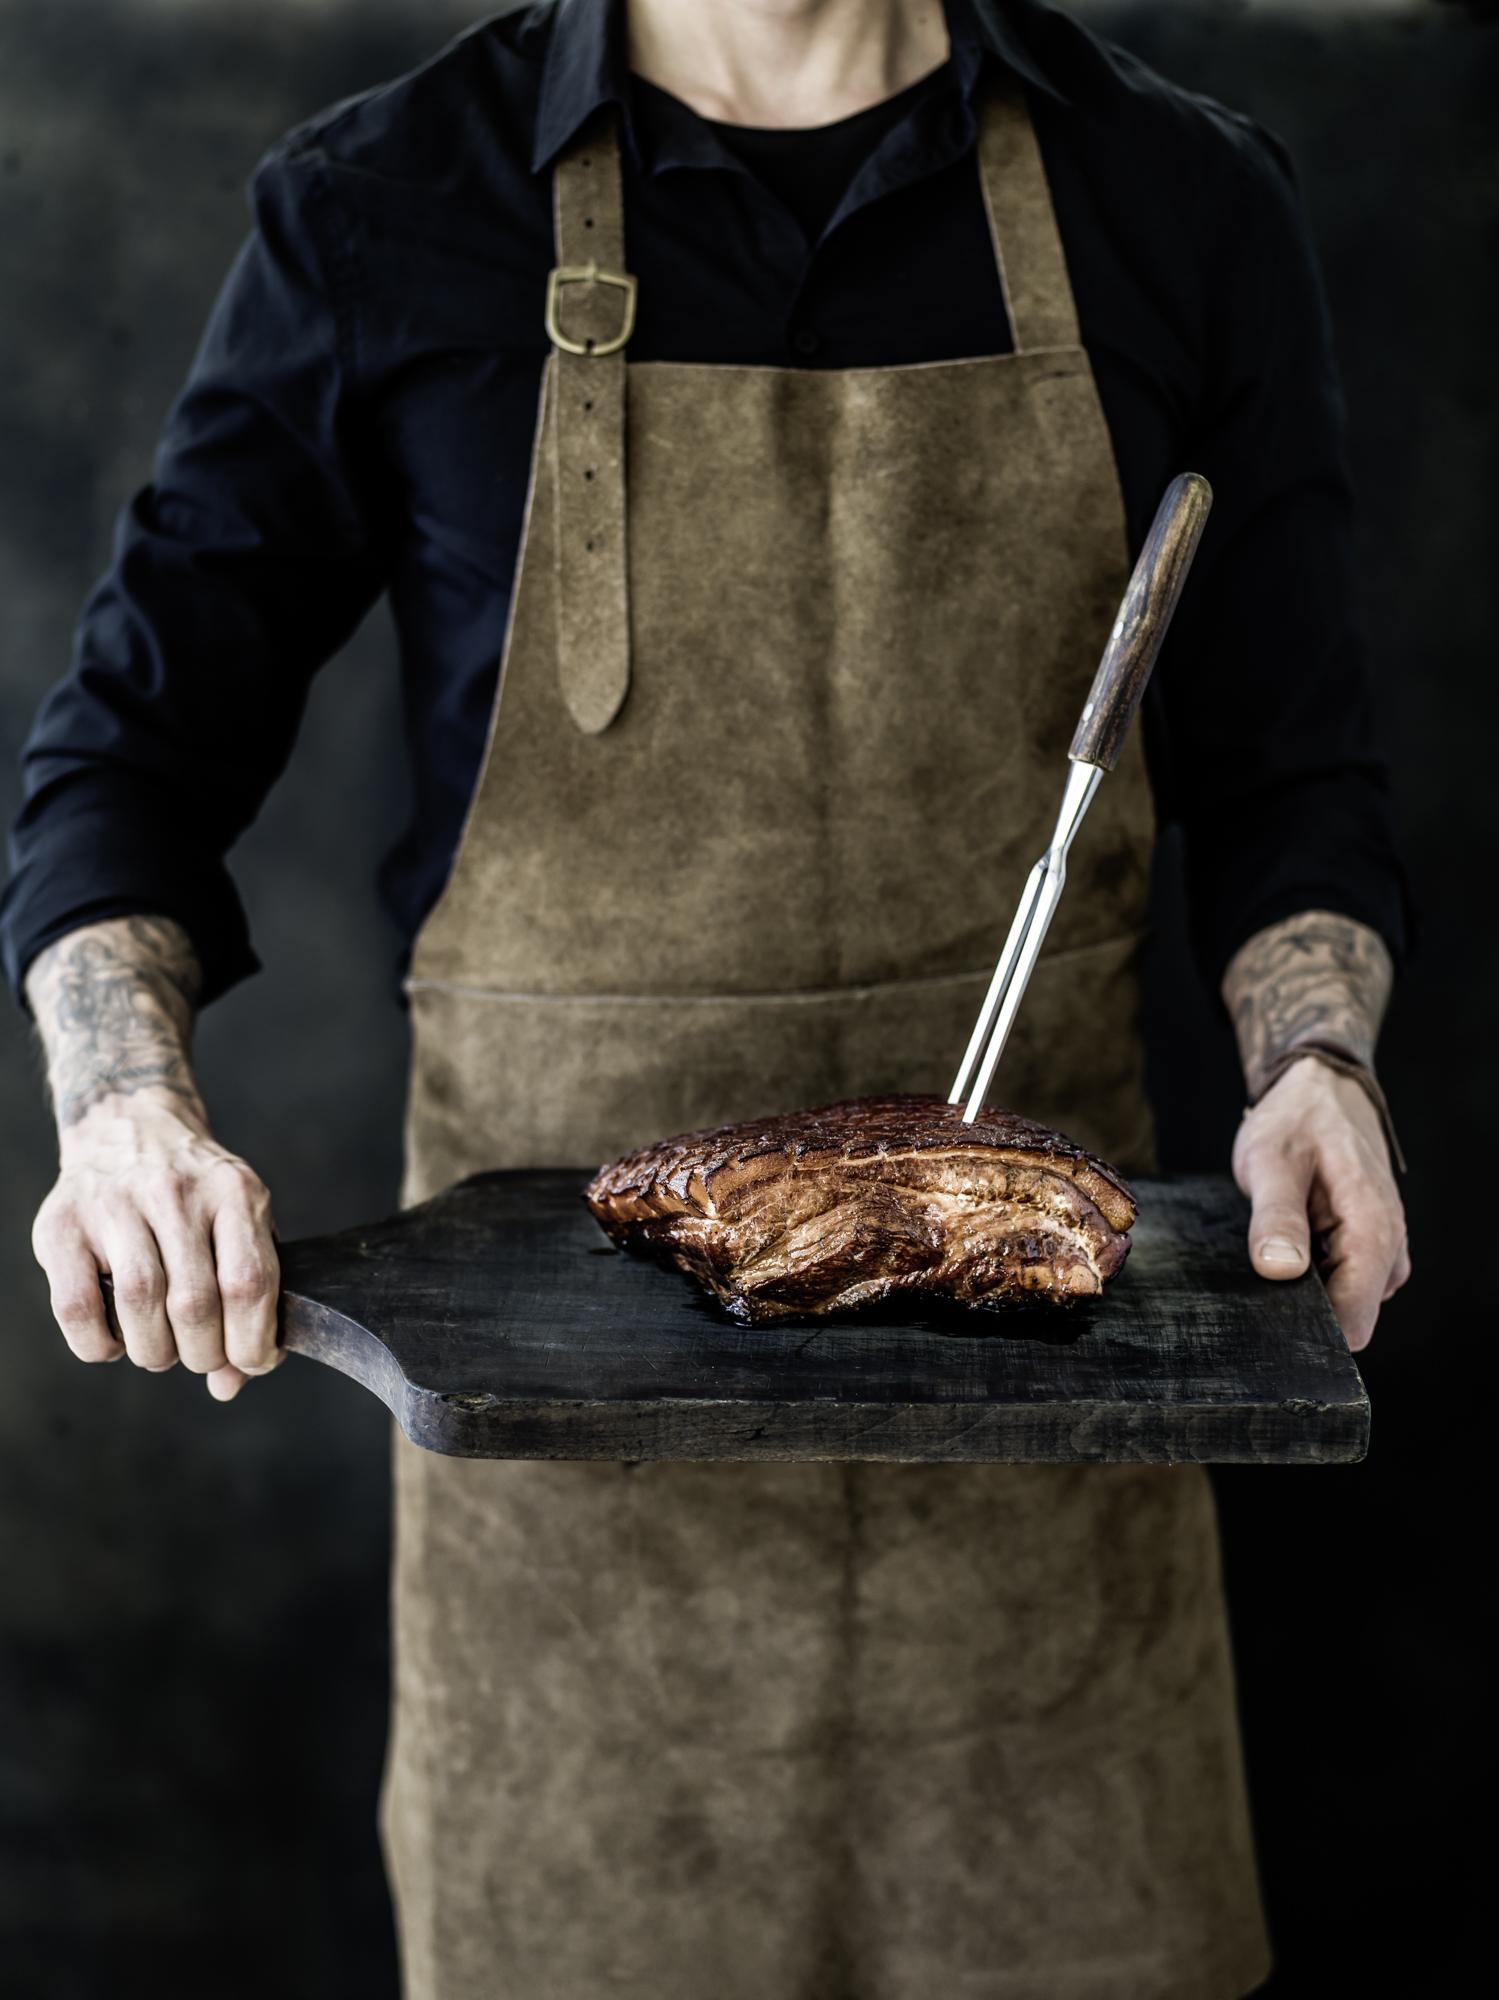 Food-Fotografie Meatlove, Stefan Schmidlin Fotograf Basel; Bild 2.jpg